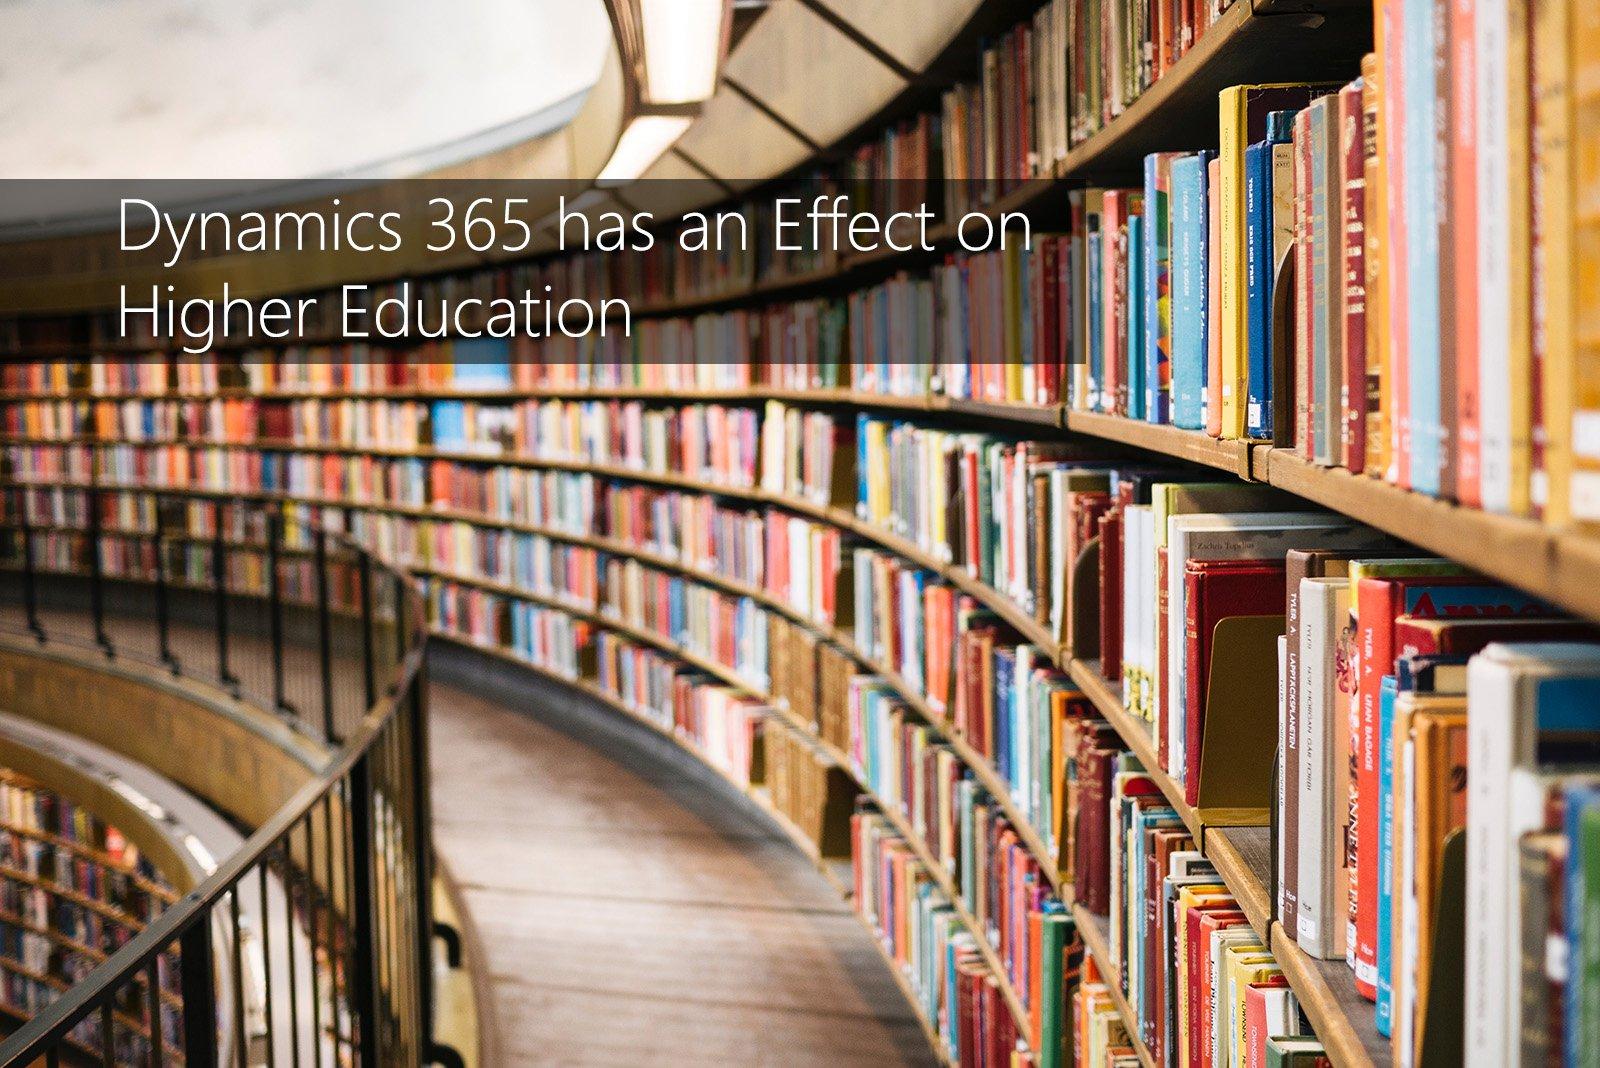 tmc-blog-dynamics-365-has-an-effect-on-higher-education